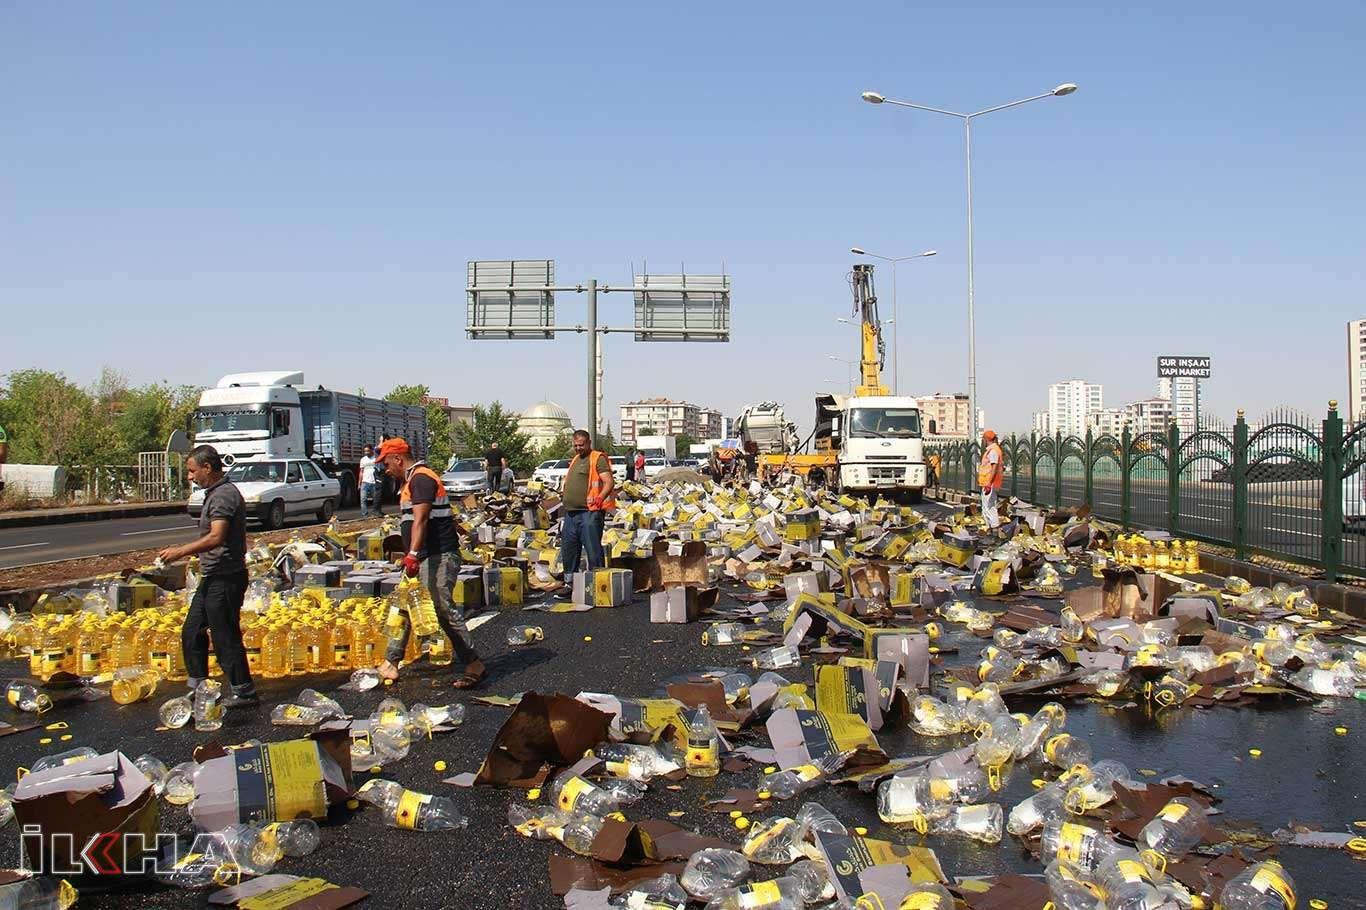 Yağ yüklü tır devrildi: Tonlarca litre yağ yola döküldü